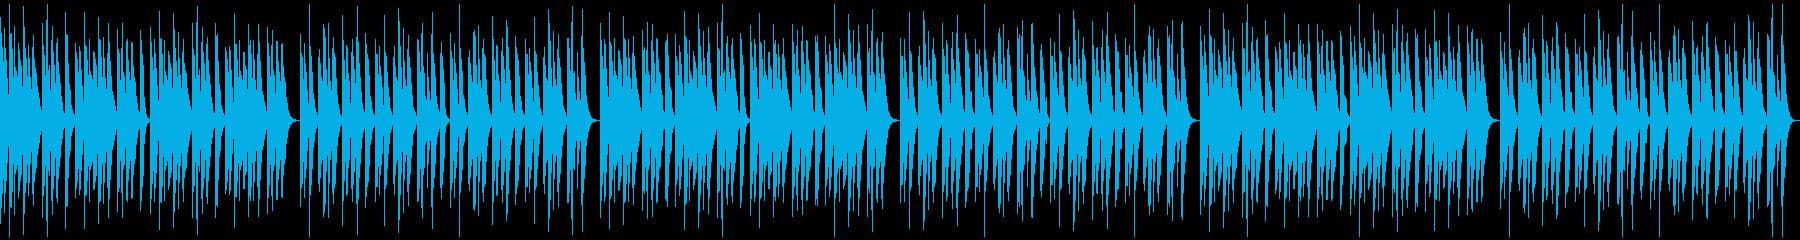 Heartwarming, everyday, loose, comical, marimba's reproduced waveform